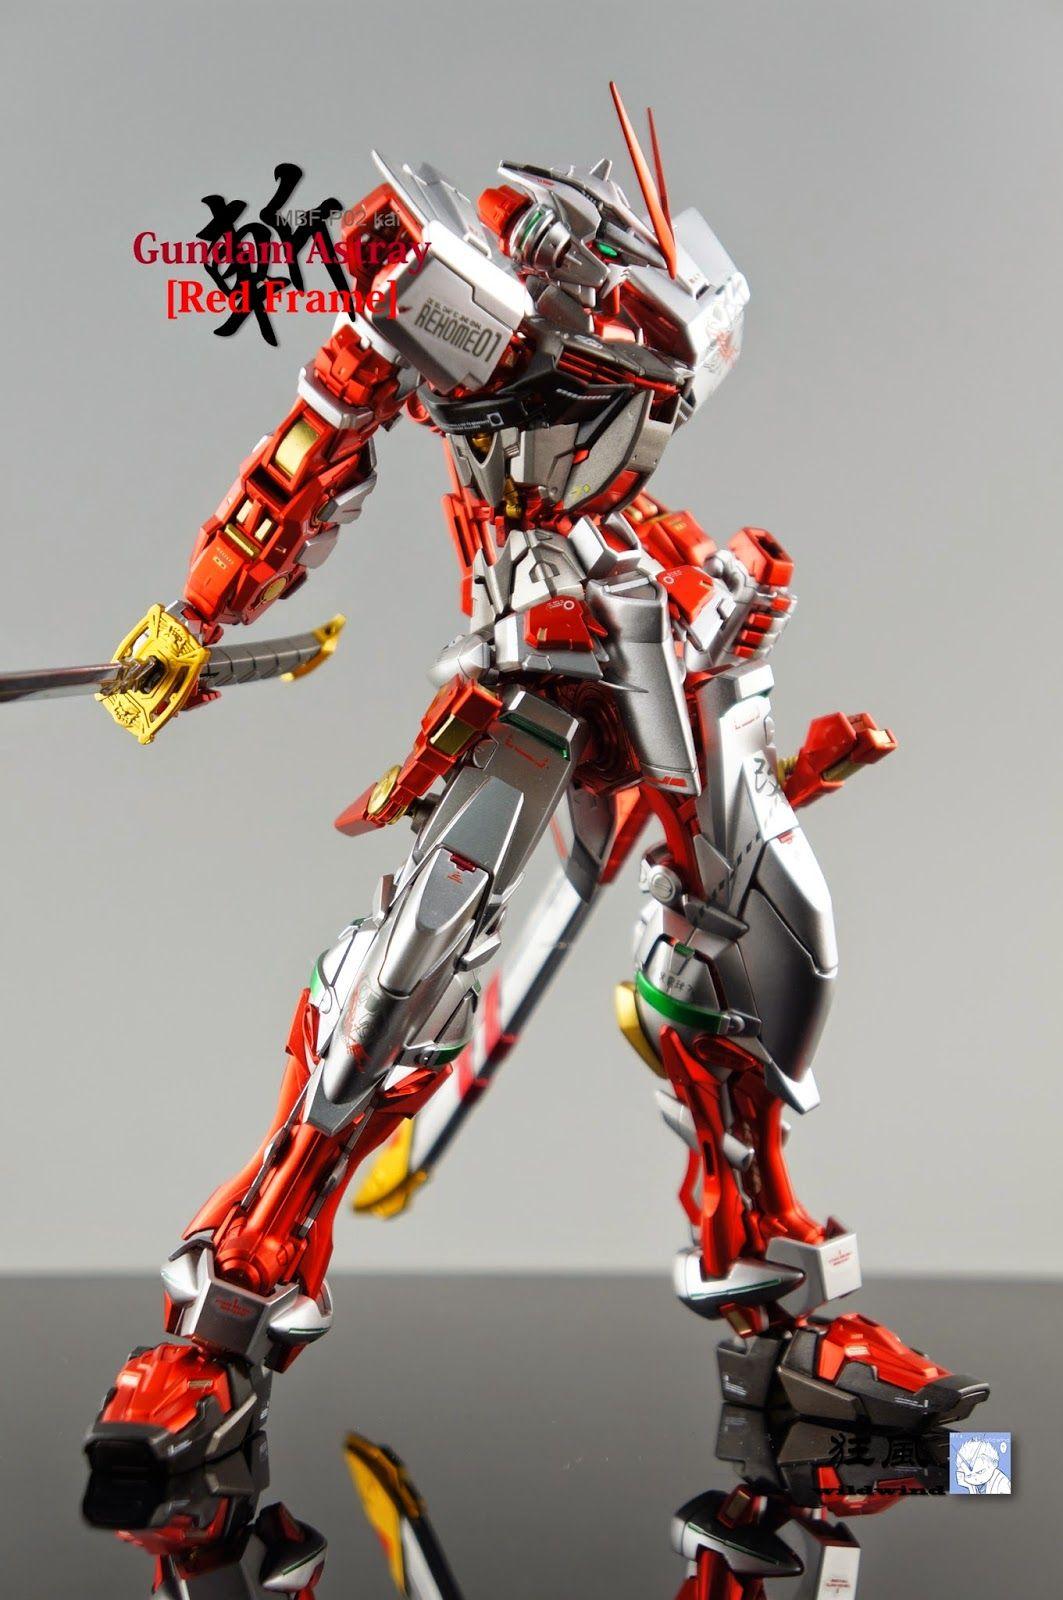 MG 1/100 Gundam Astray Red Frame Kai Painted Build